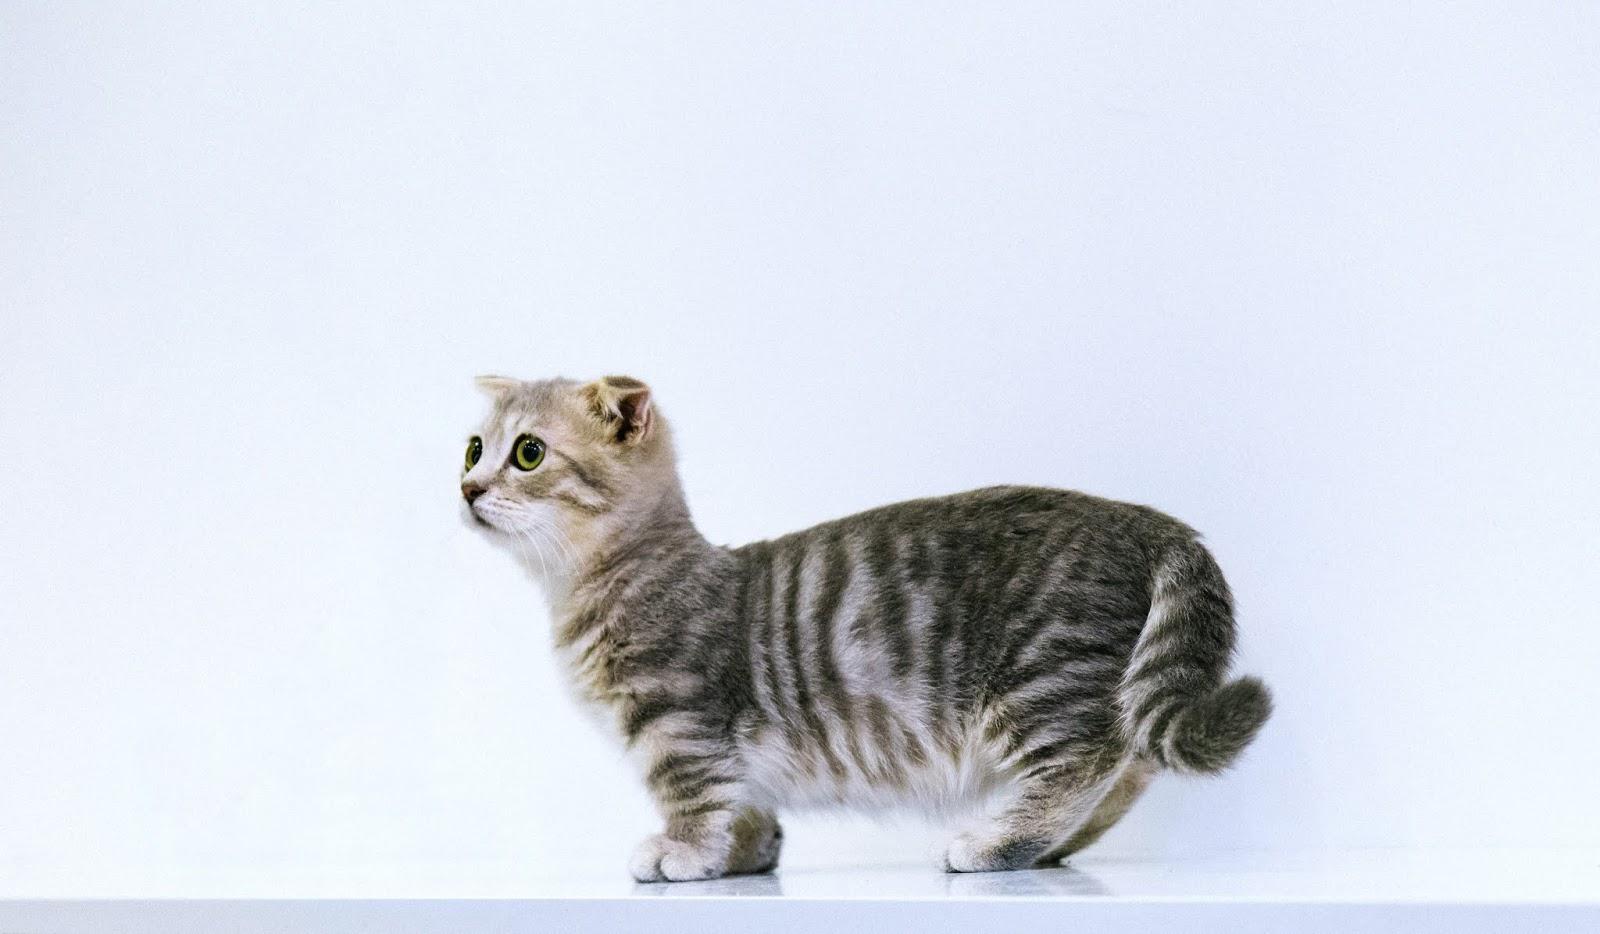 Short fur grey cat on the white floor,cat images